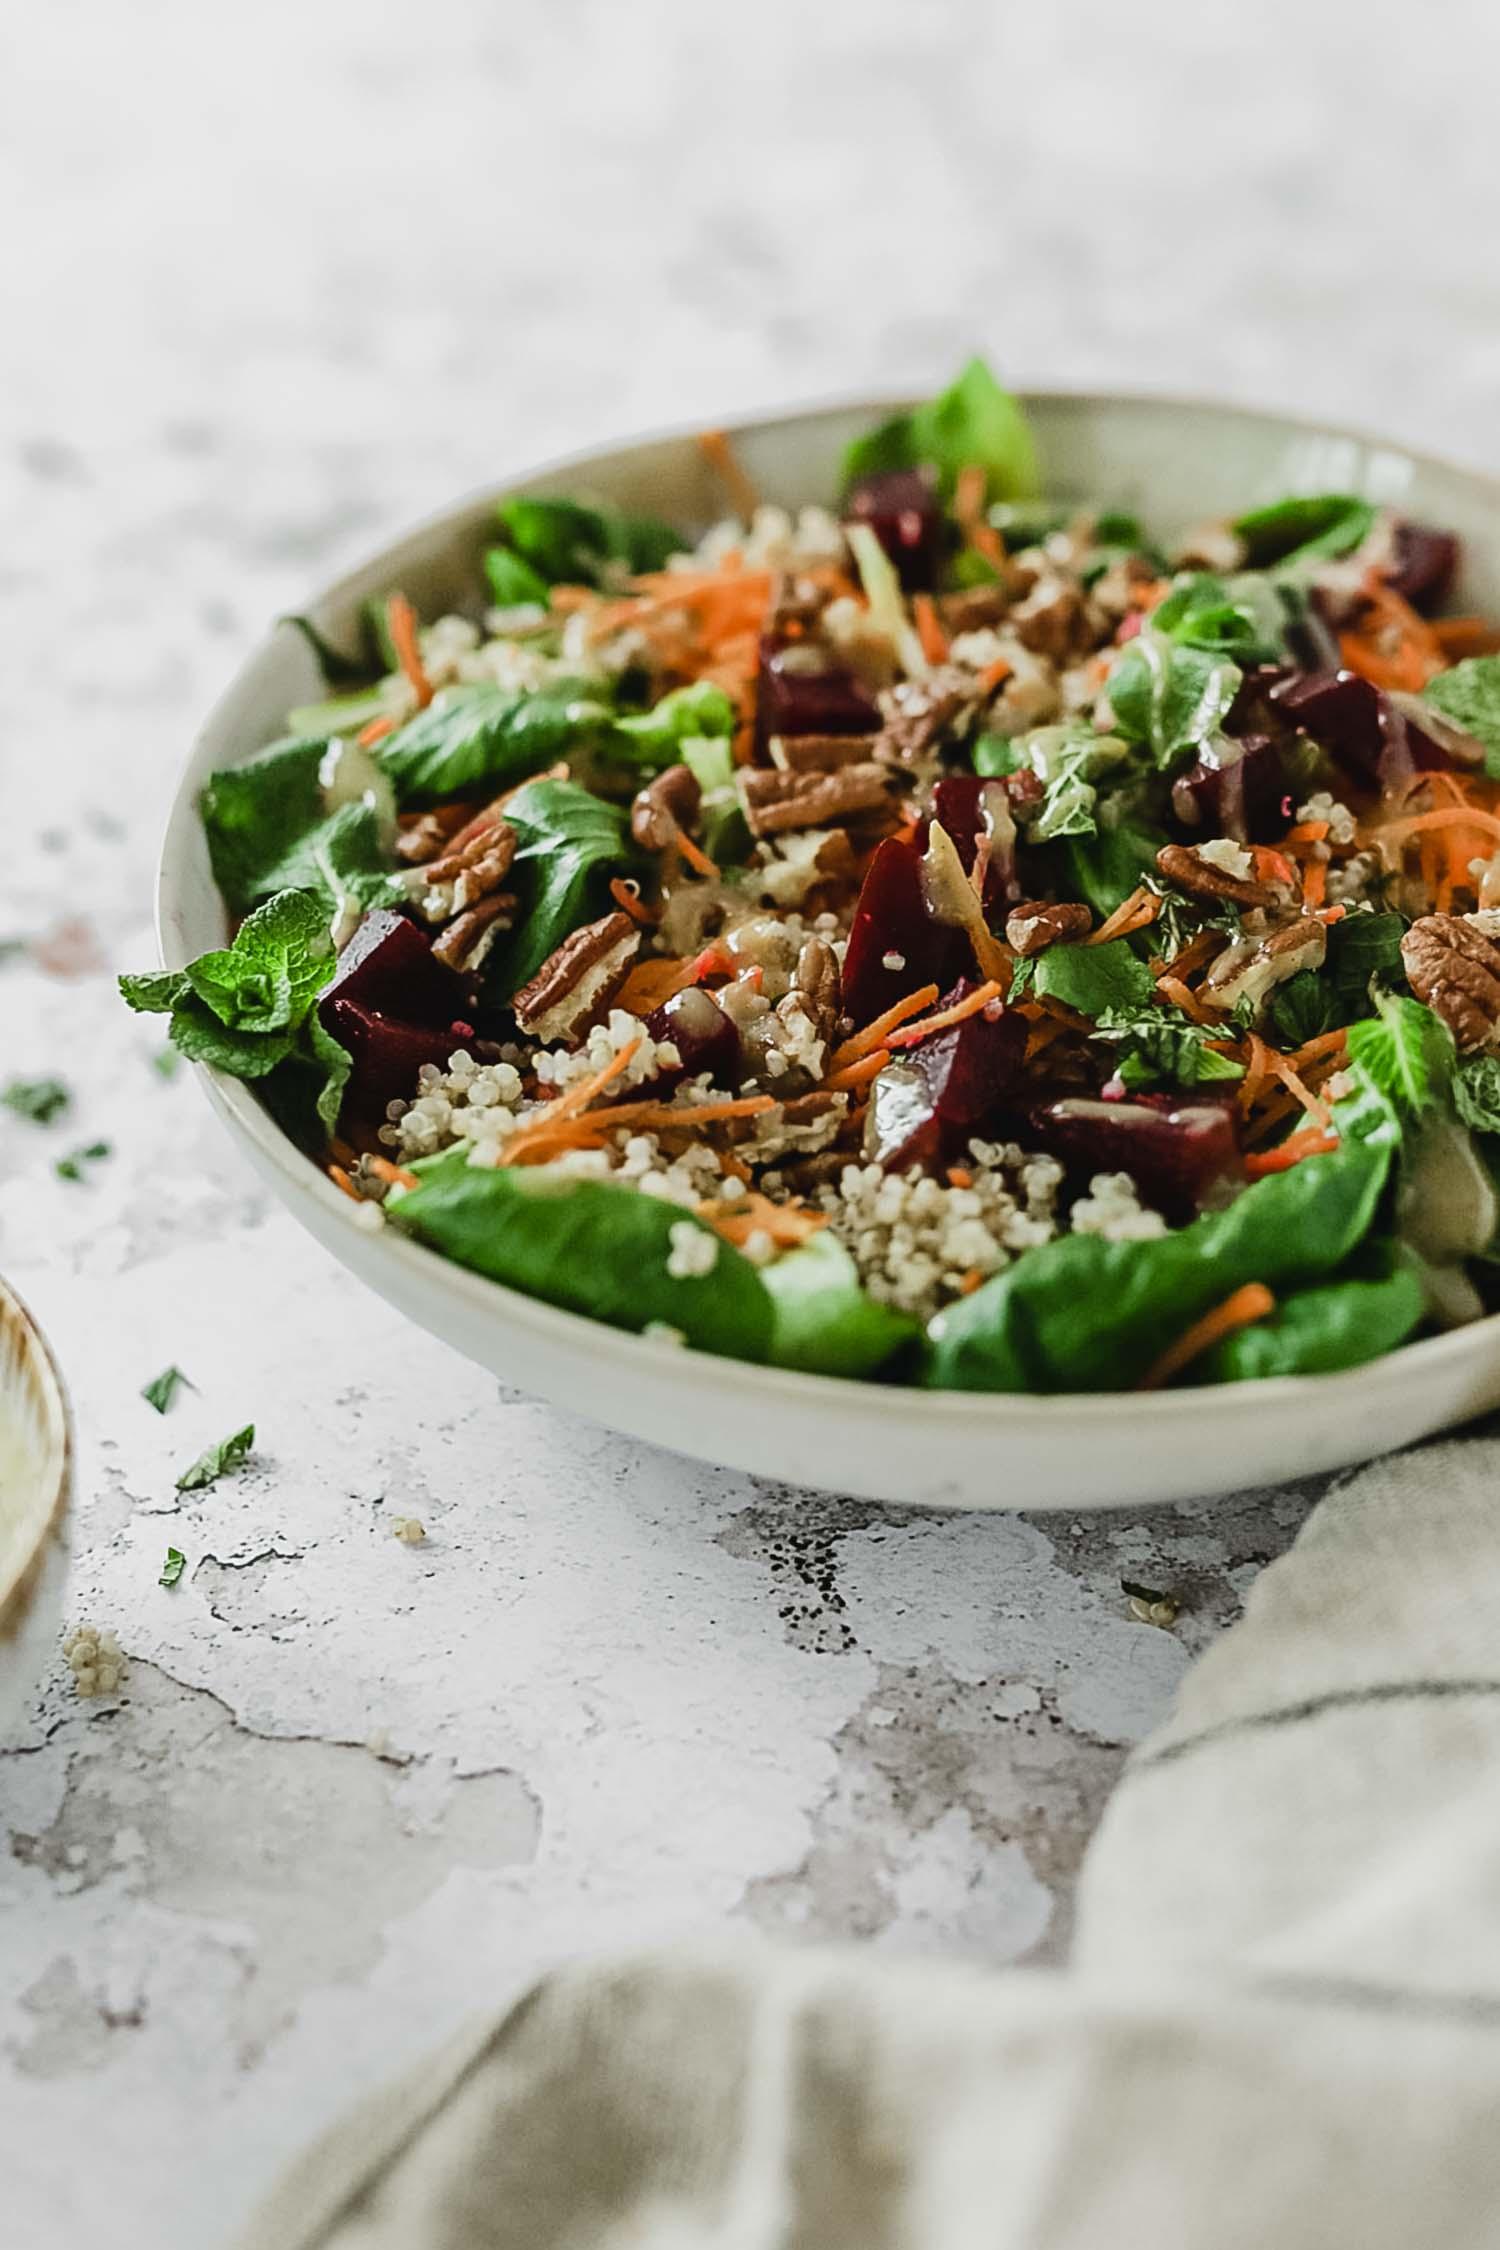 Recette vegan salade anti inflammatoire detox